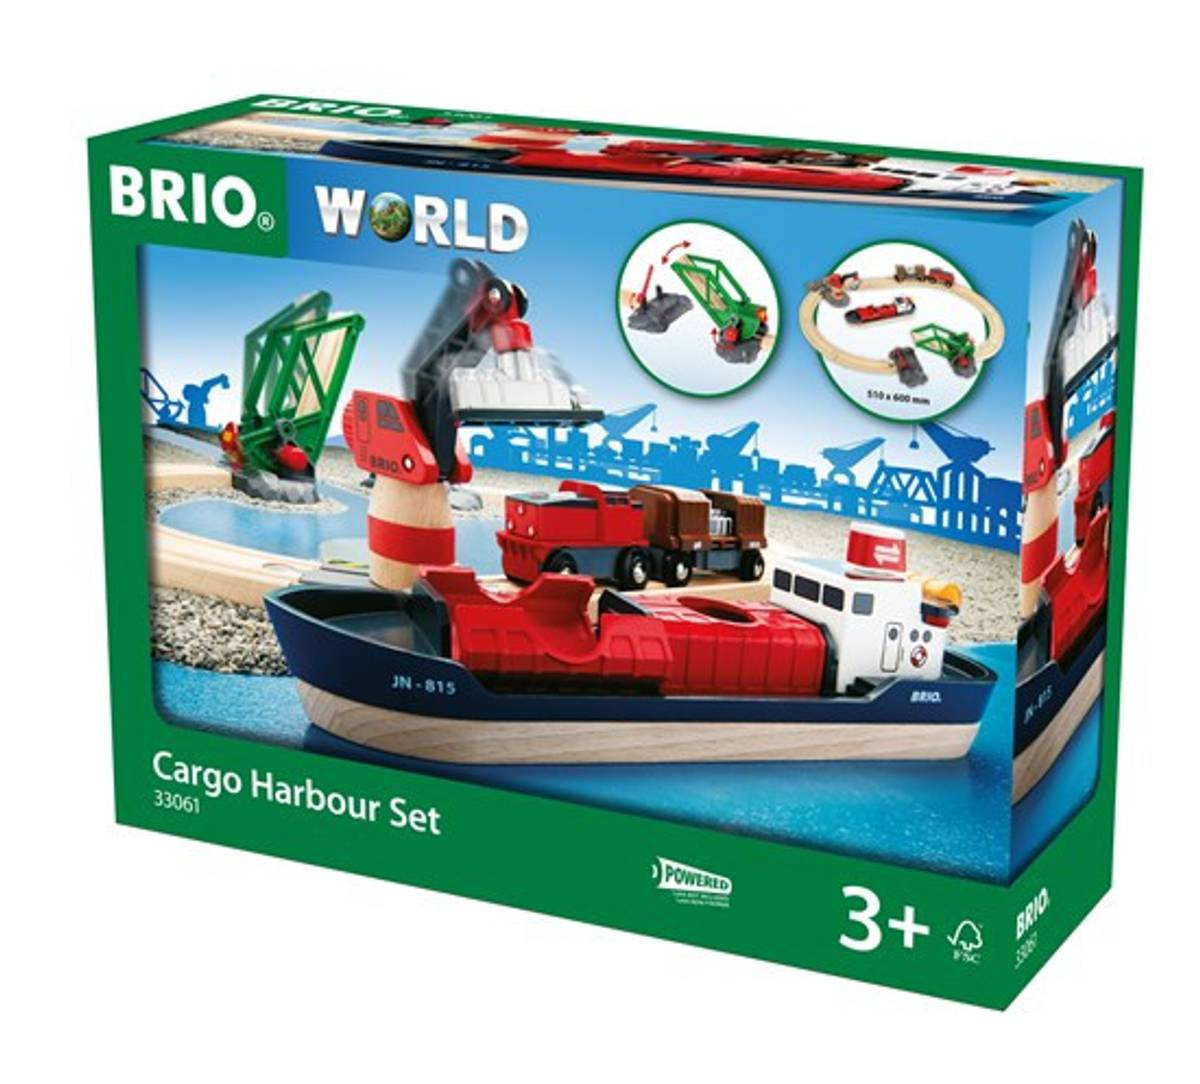 BRIO Togbane Havne sett 16 deler